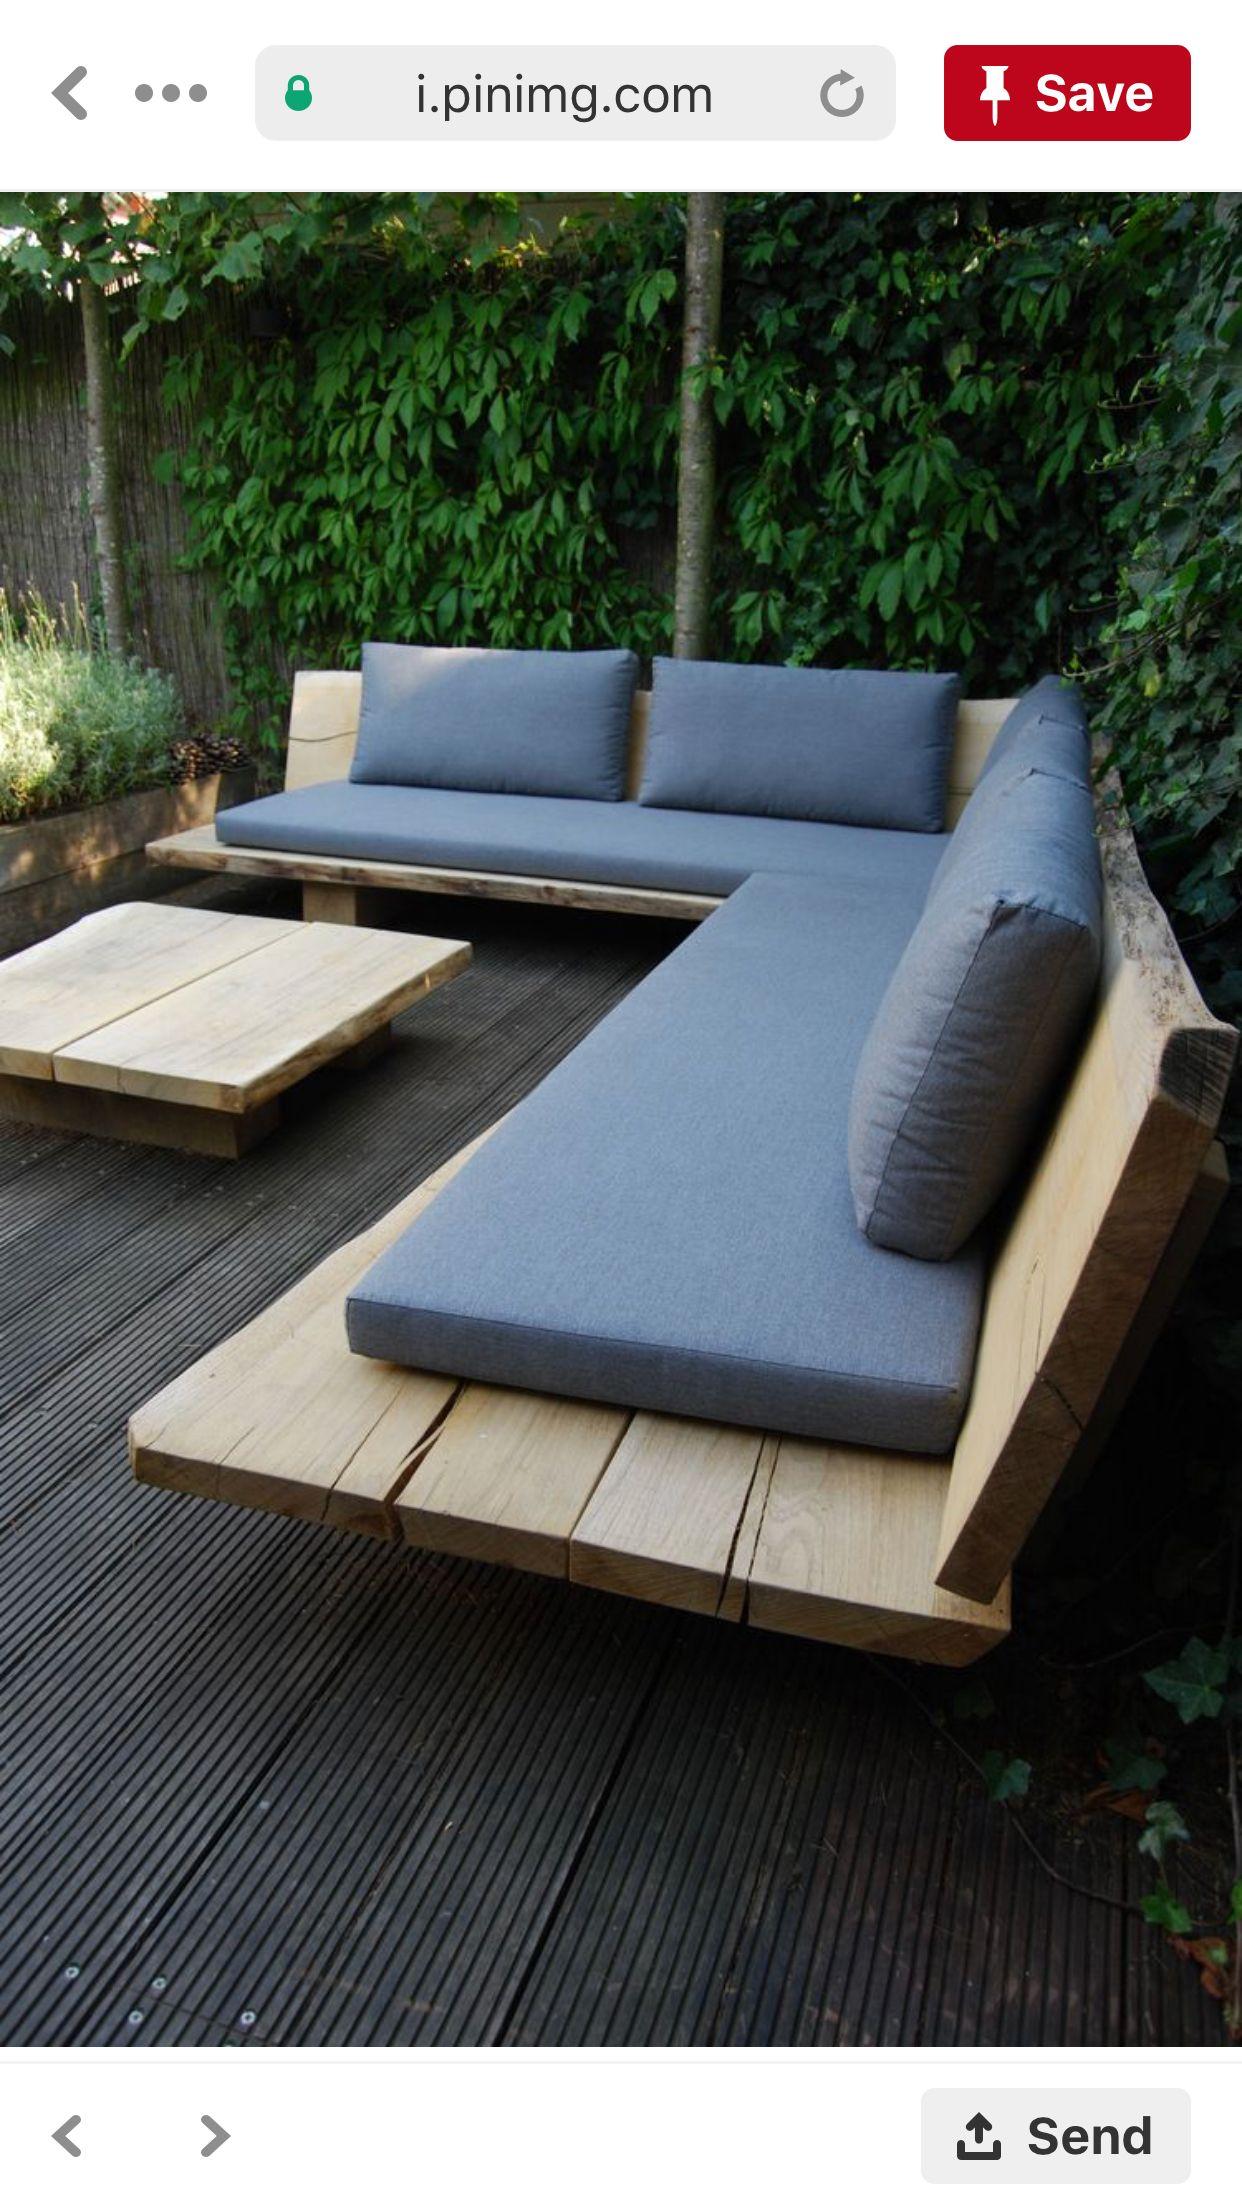 Outdoor Seating Holzbank Garten Garten Couch Gartensofa